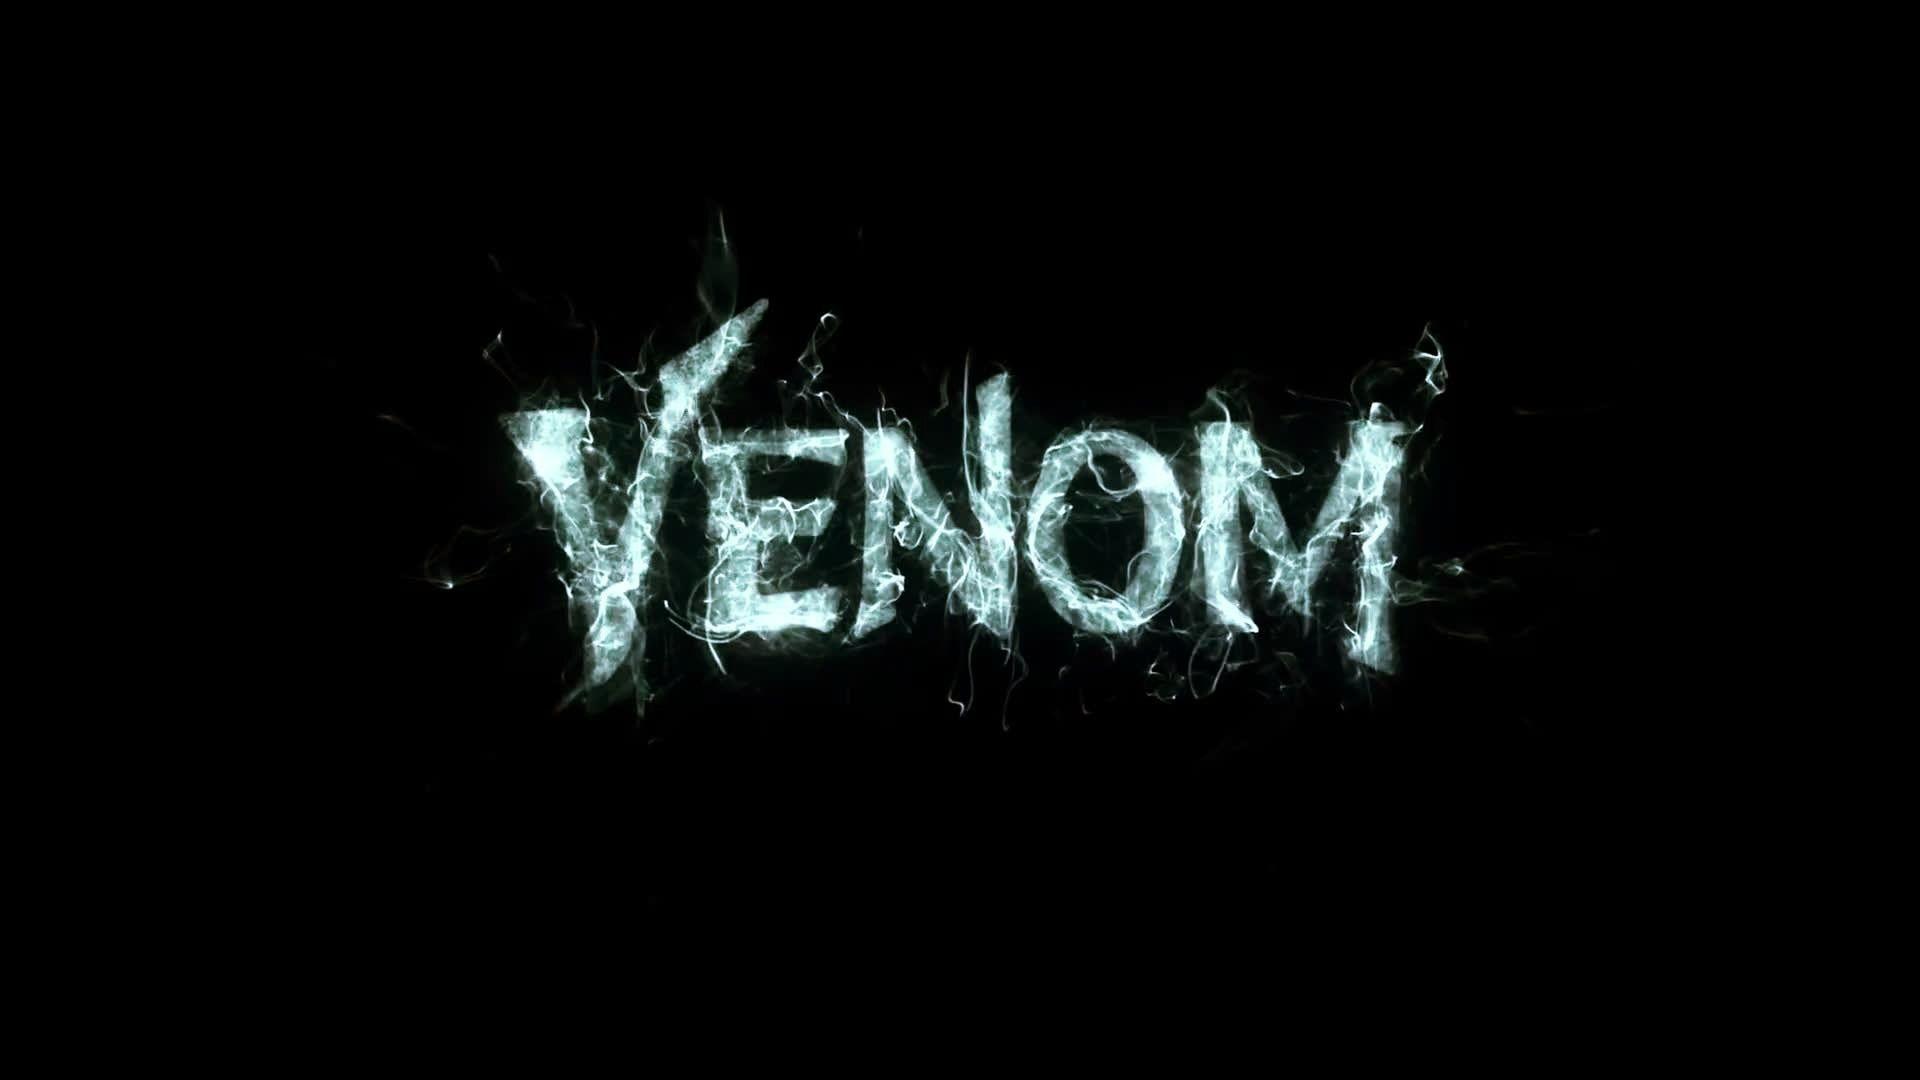 Venom Movie Wallpapers Top Free Venom Movie Backgrounds